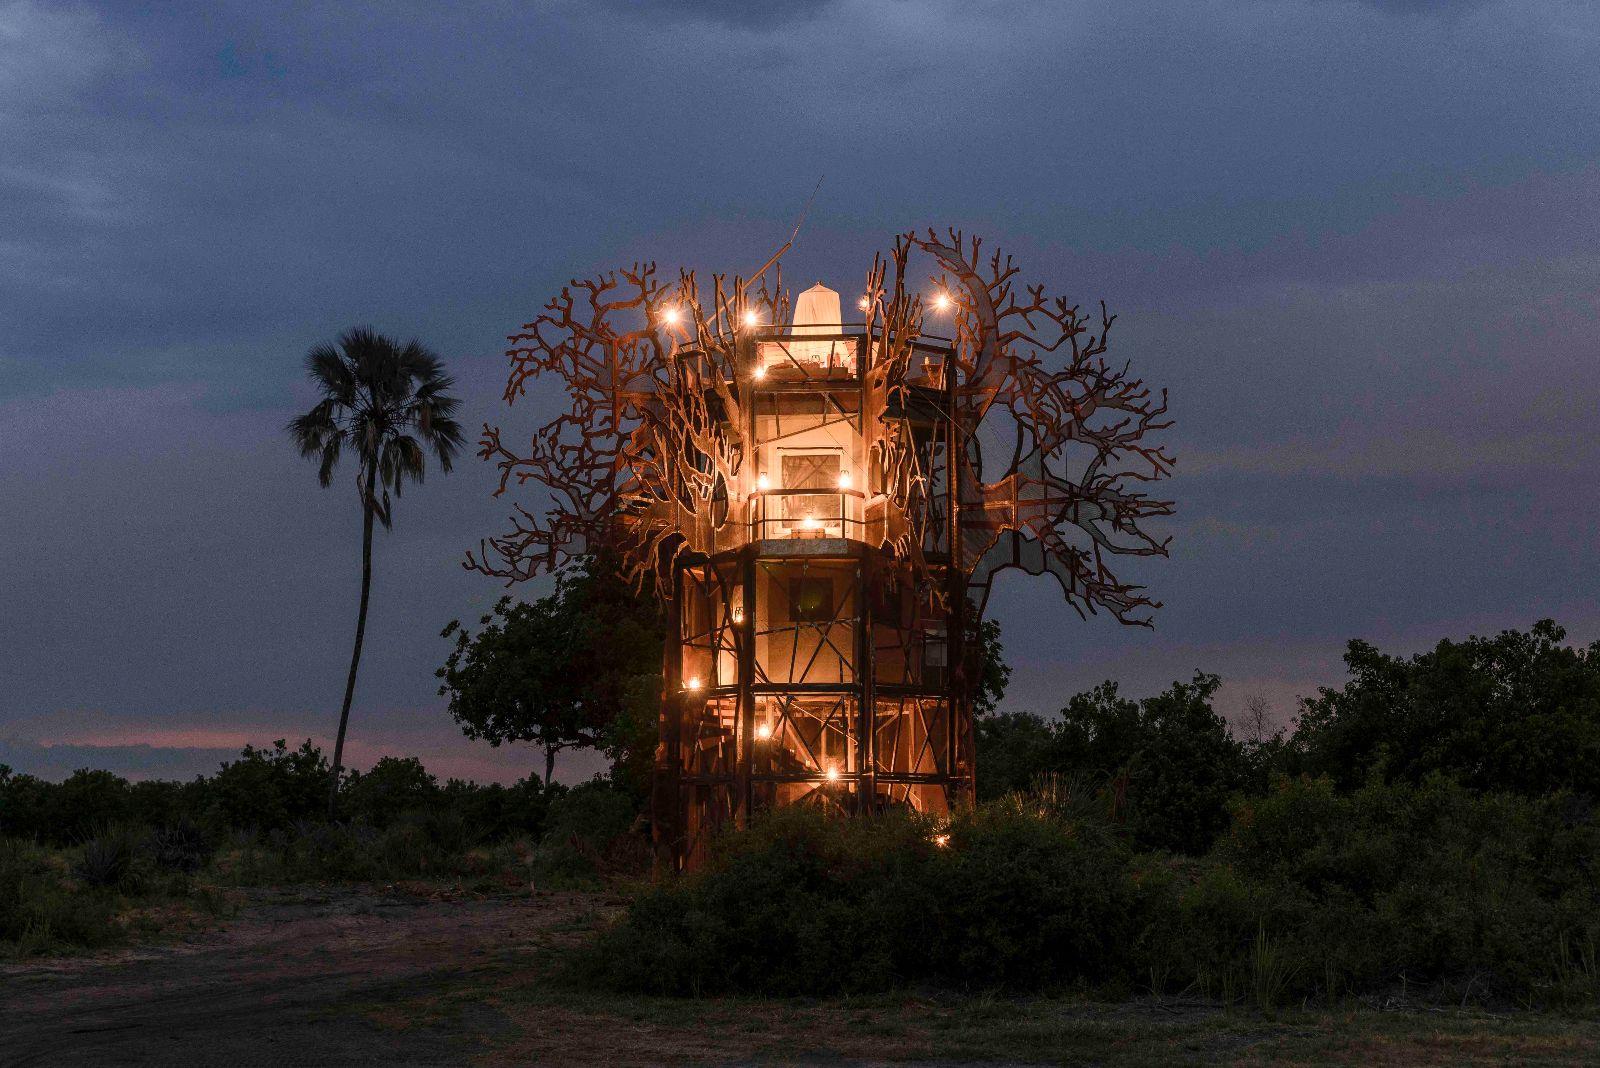 Xigera Safari Lodge's Baobab Treehouse